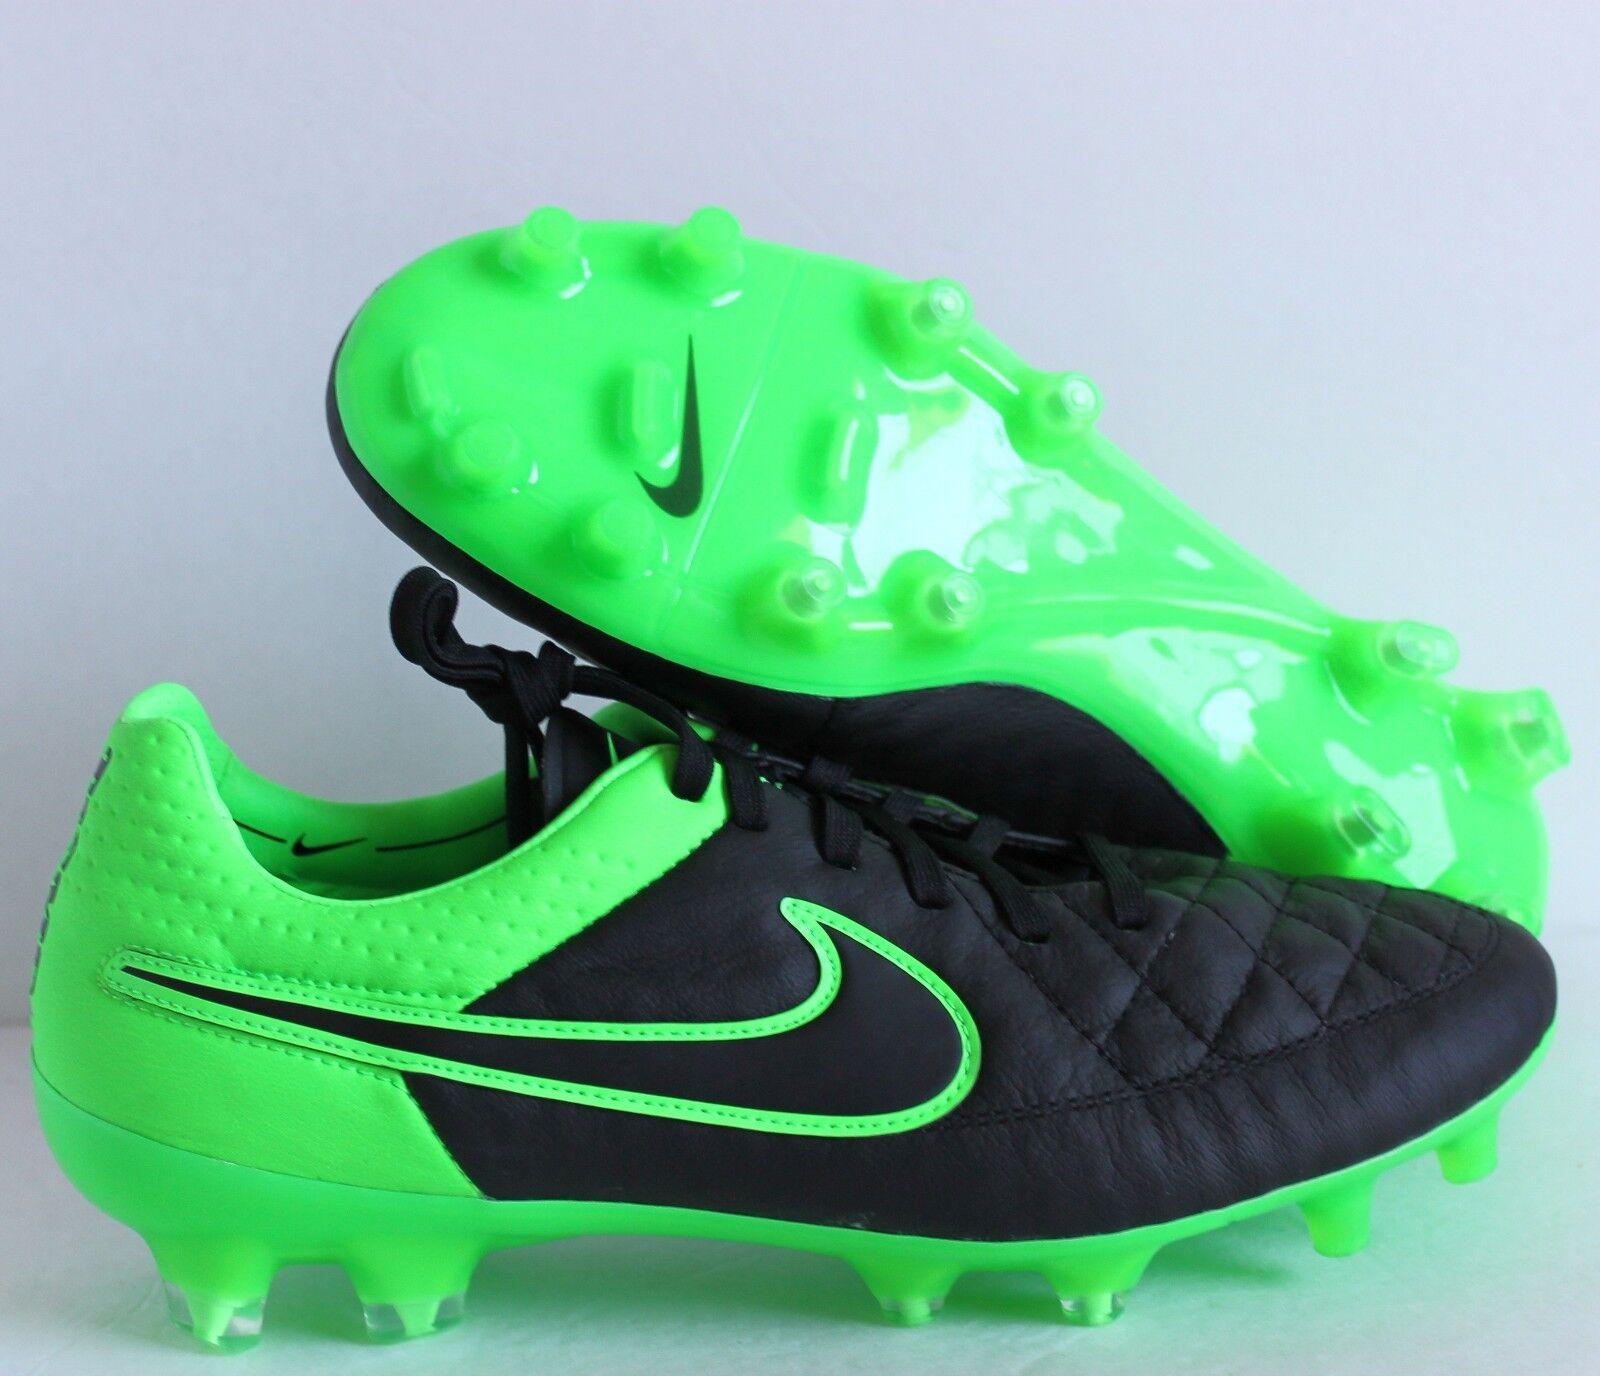 Nike tiempo legende schuh / fg fußball - schuh legende schwarz / grün sz 8,5 [631518-003] 1e5a88